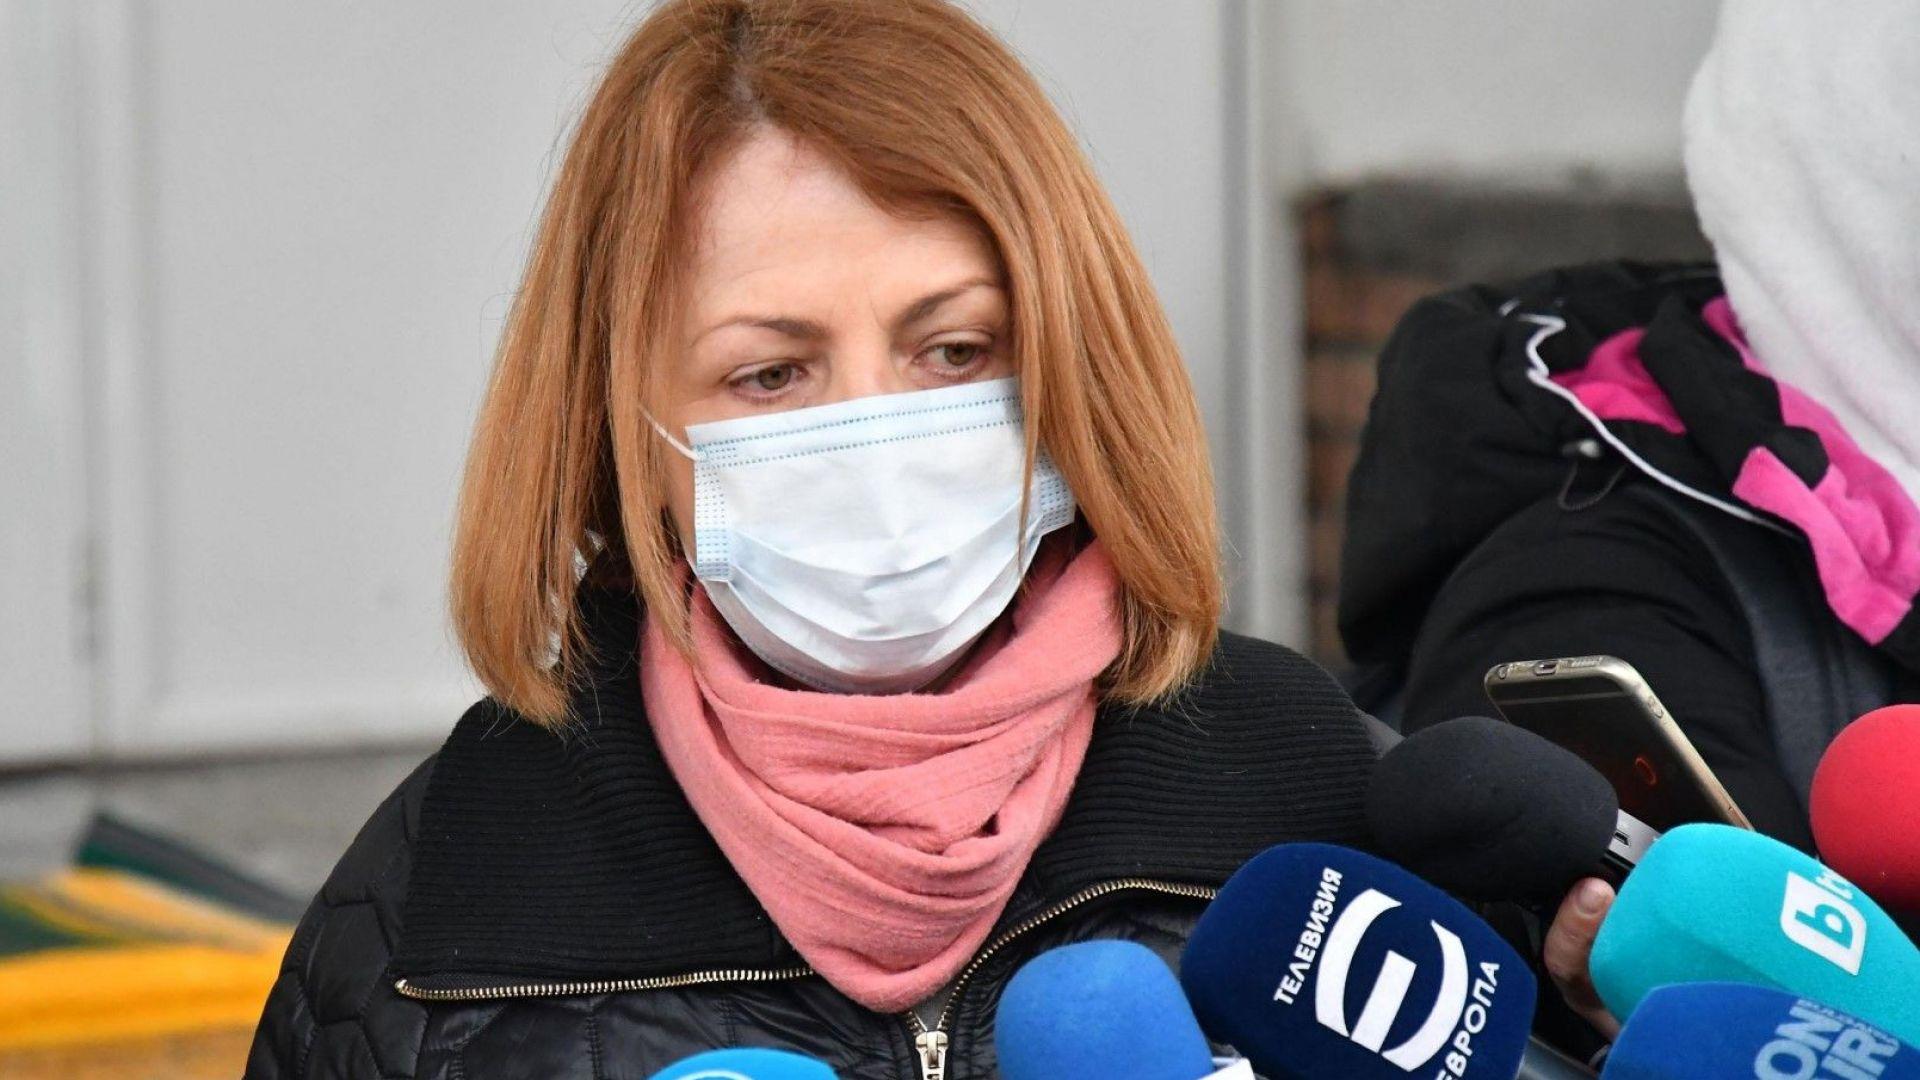 Фандъкова: Ще слагаме датчици на шахтите, собственик на обекта е прекарал кабела